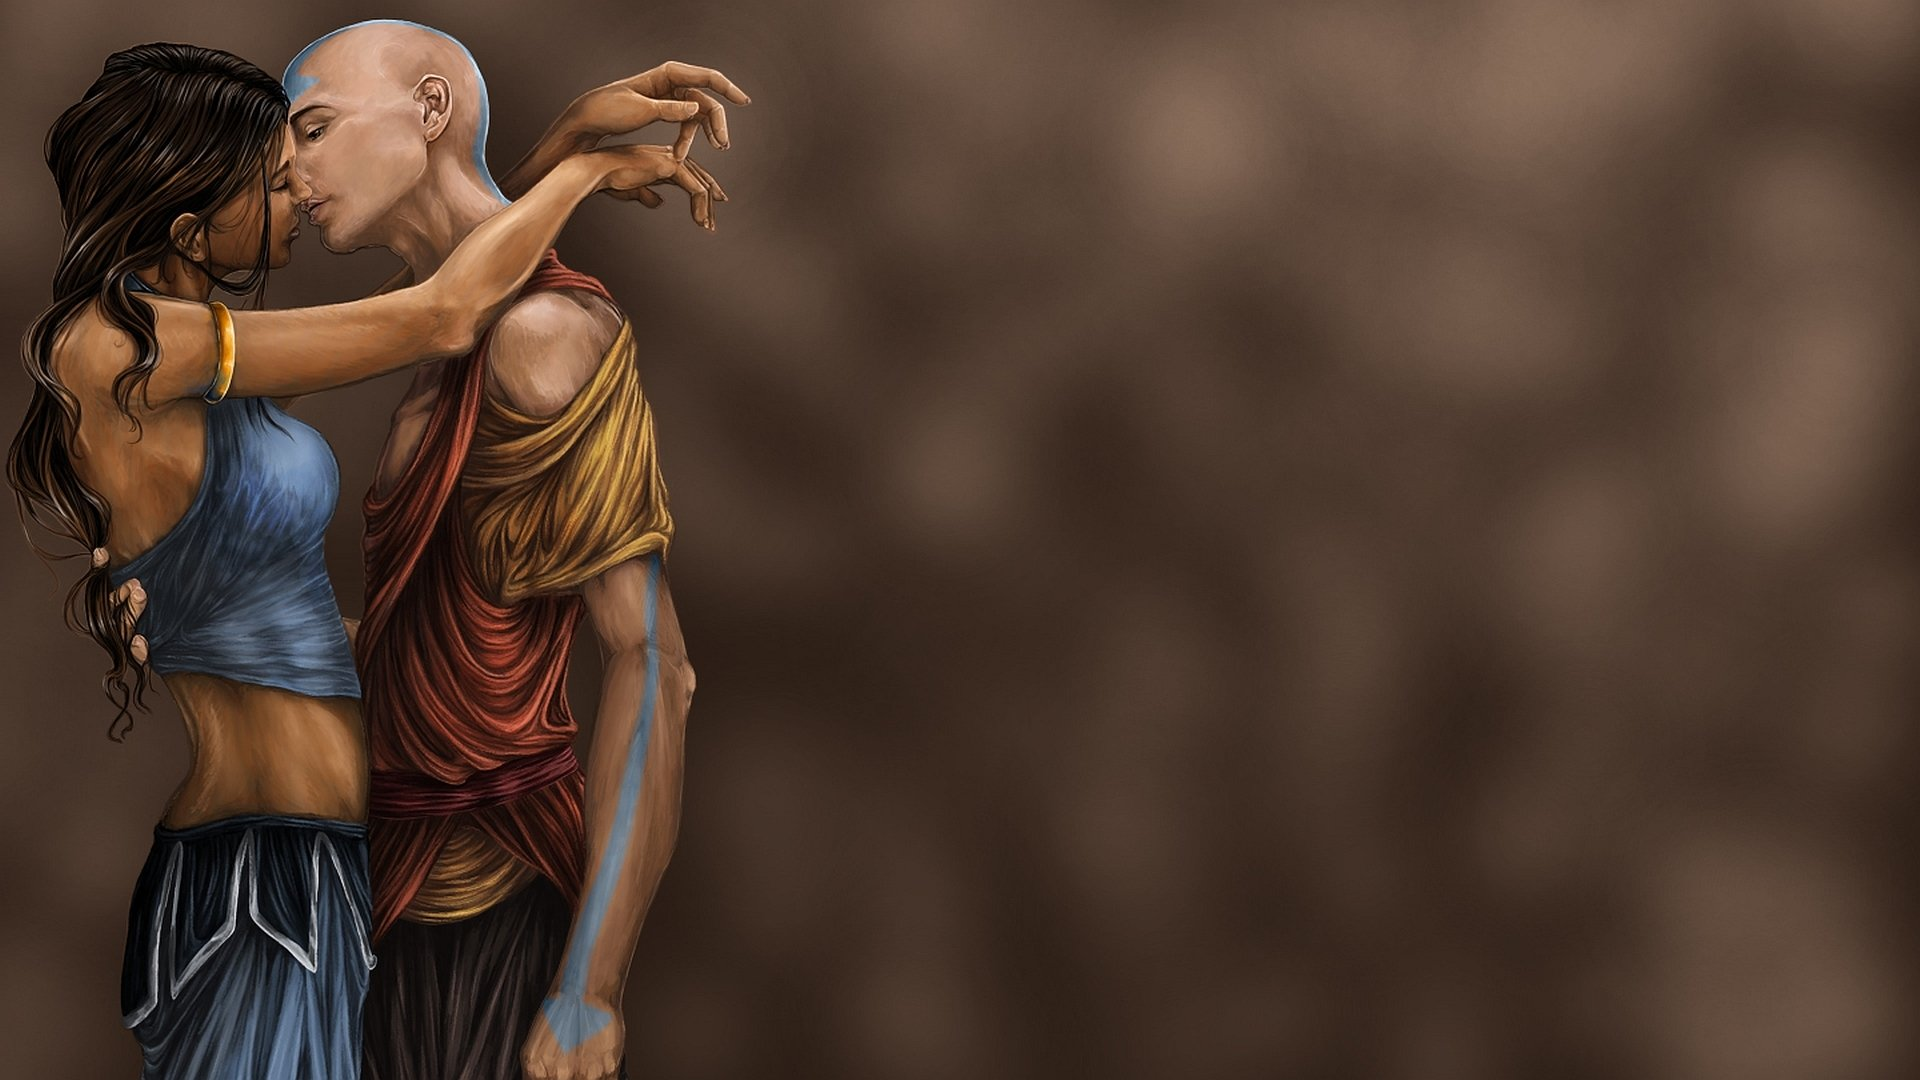 Avatar Wallpaper by matheusmmt - b1 - Free on ZEDGE